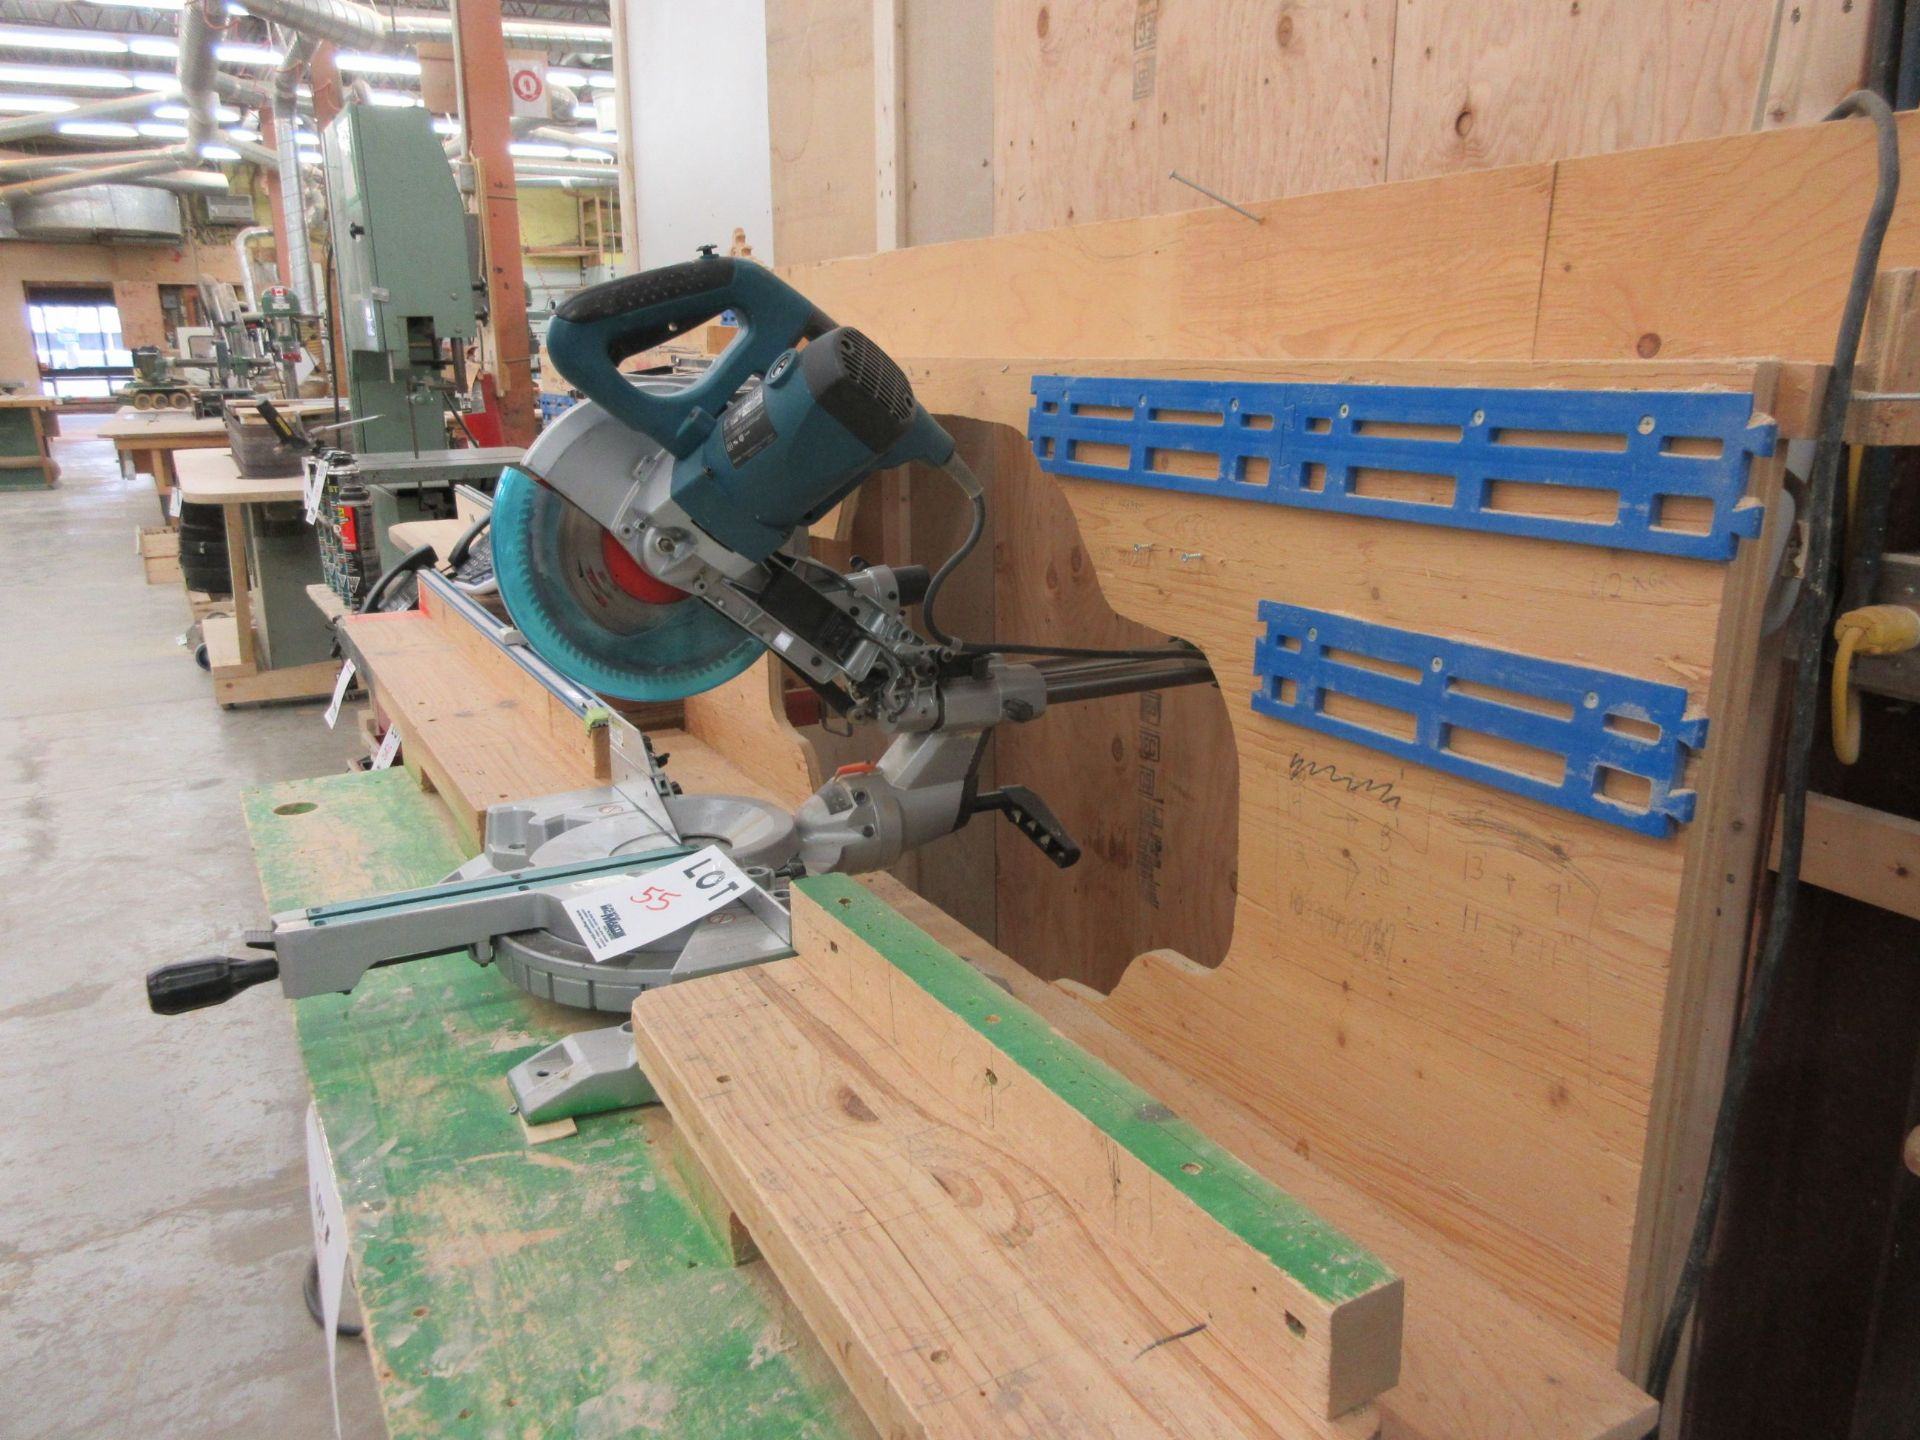 MAKITA miter saw, Mod: LS1018L c/w work table - Image 4 of 5